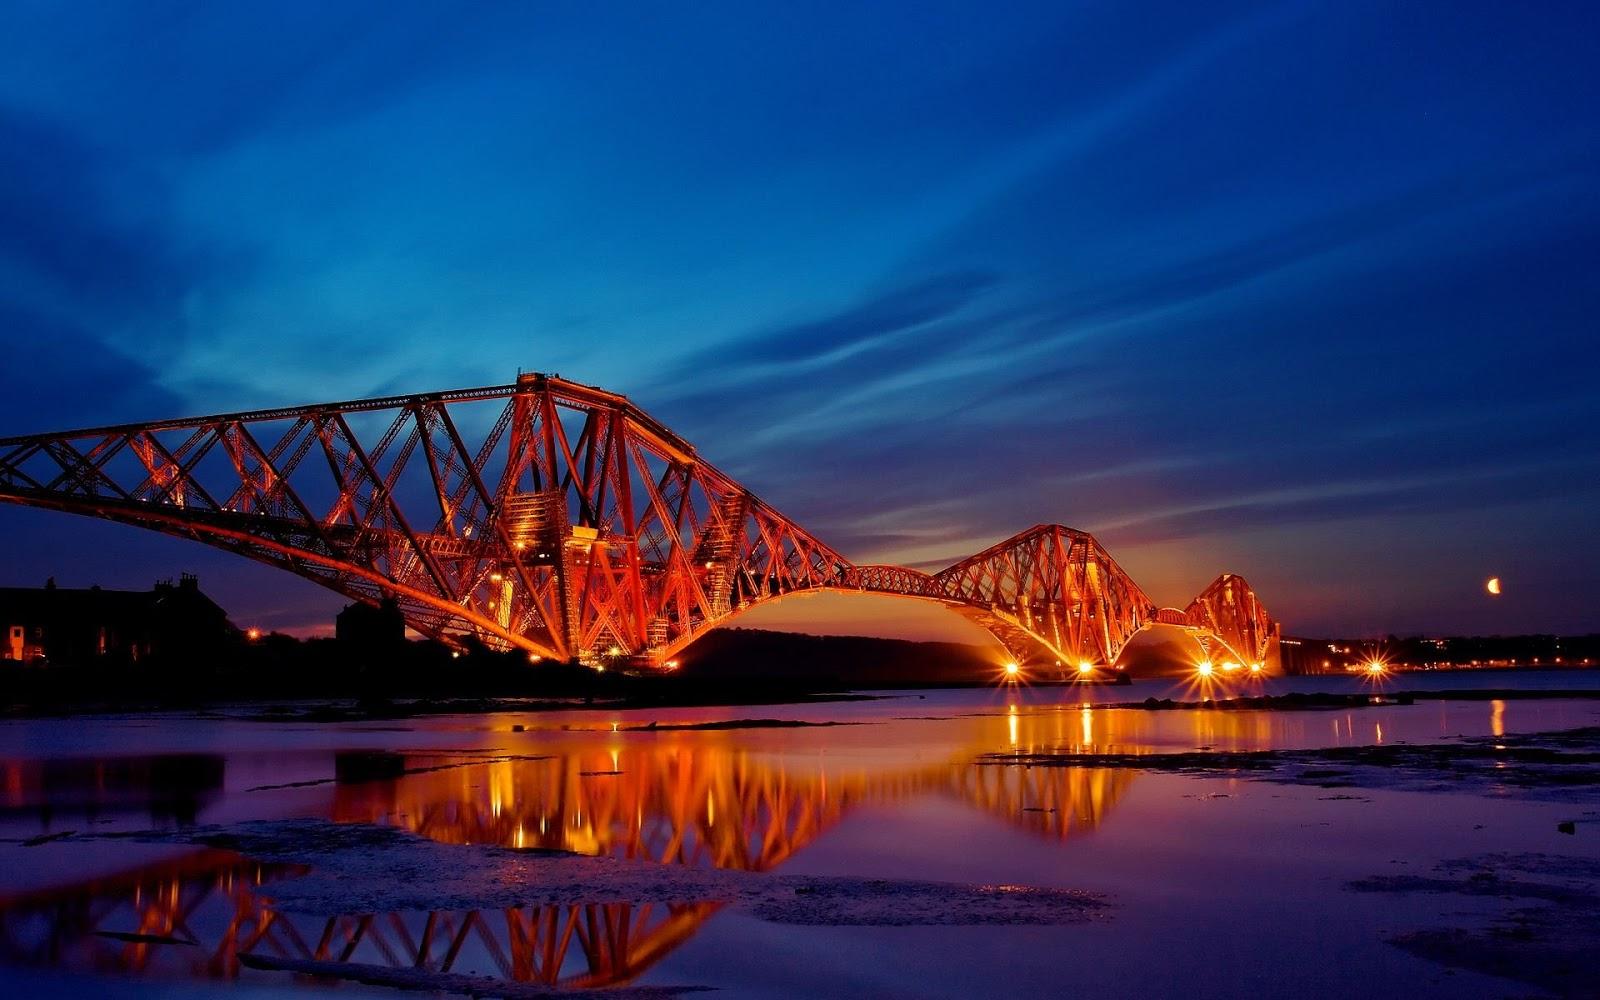 Bridge Seen at Night